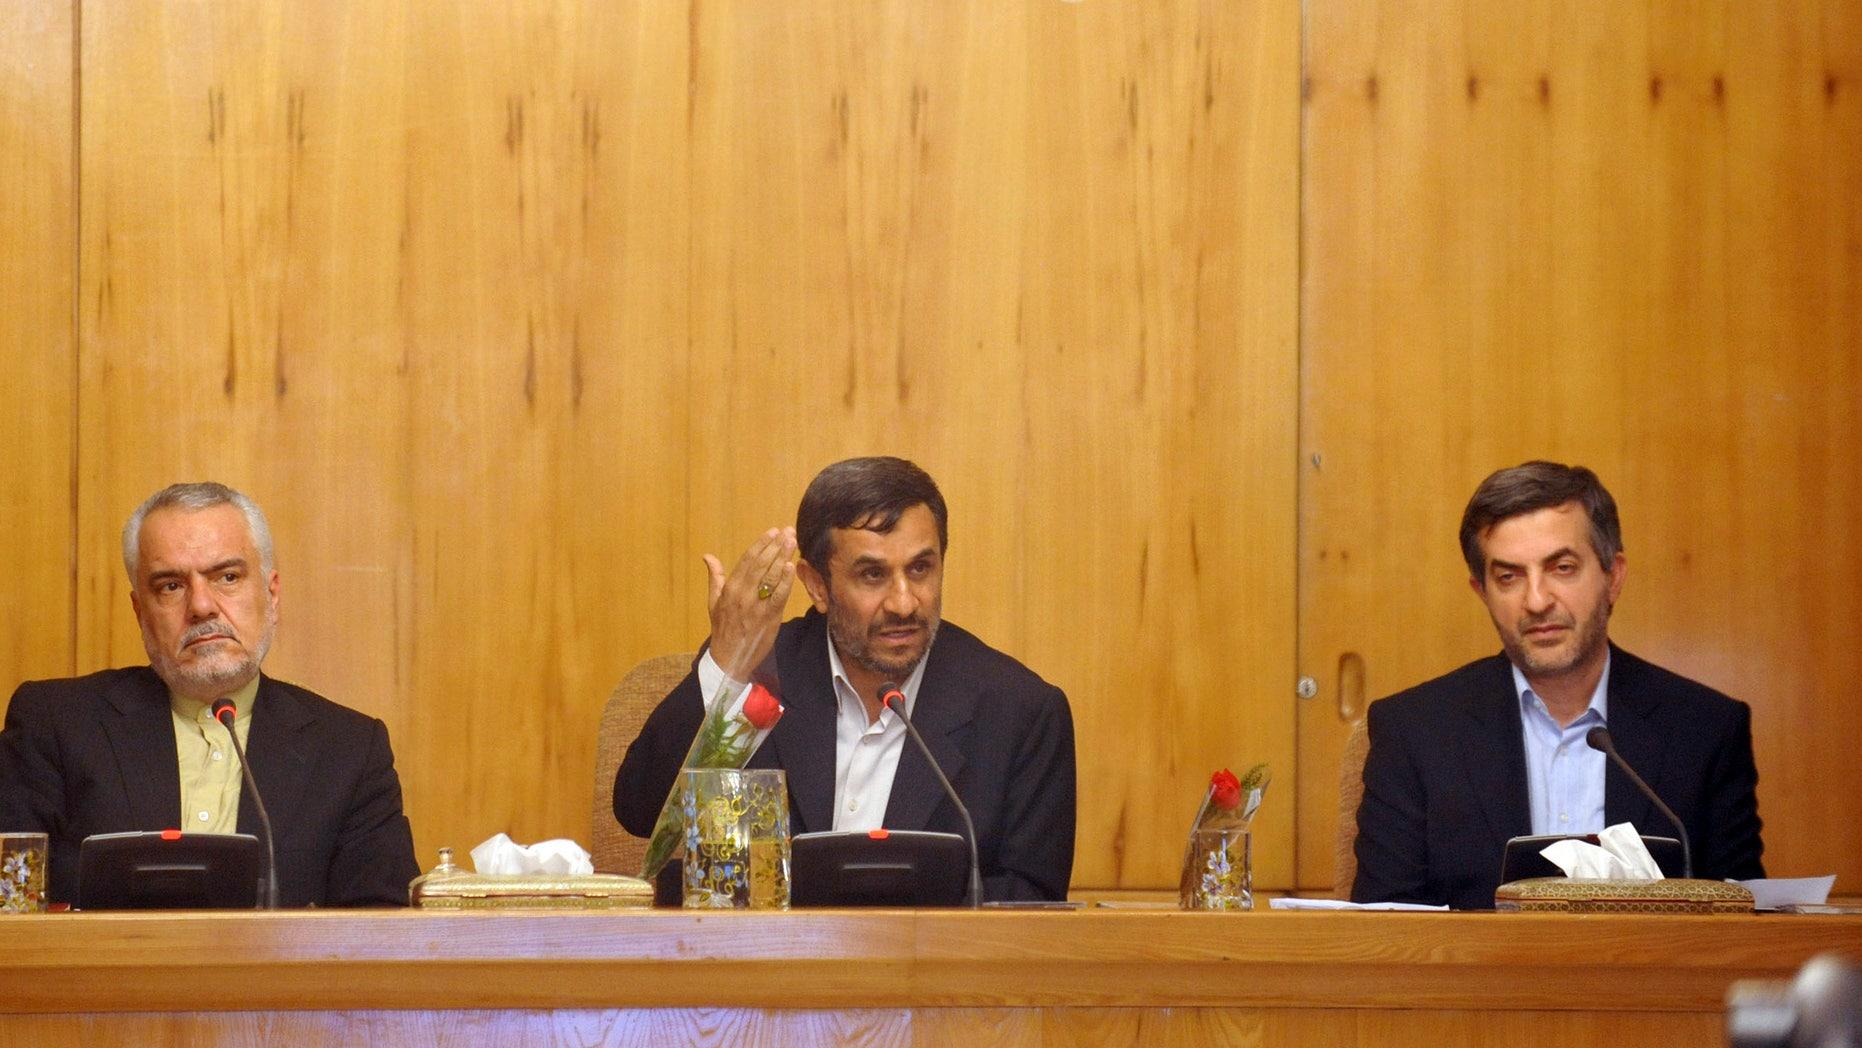 In this Sunday, May 1, 2011 file photo, Iranian President Mahmoud Ahmadinejad, center, speaks, as his office director, Esfandiar Rahim Mashaei, right, and Vice-President Mohammad Reza Rahimi, listen, in a cabinet meeting, in Tehran, Iran. (AP/IIPA/File)